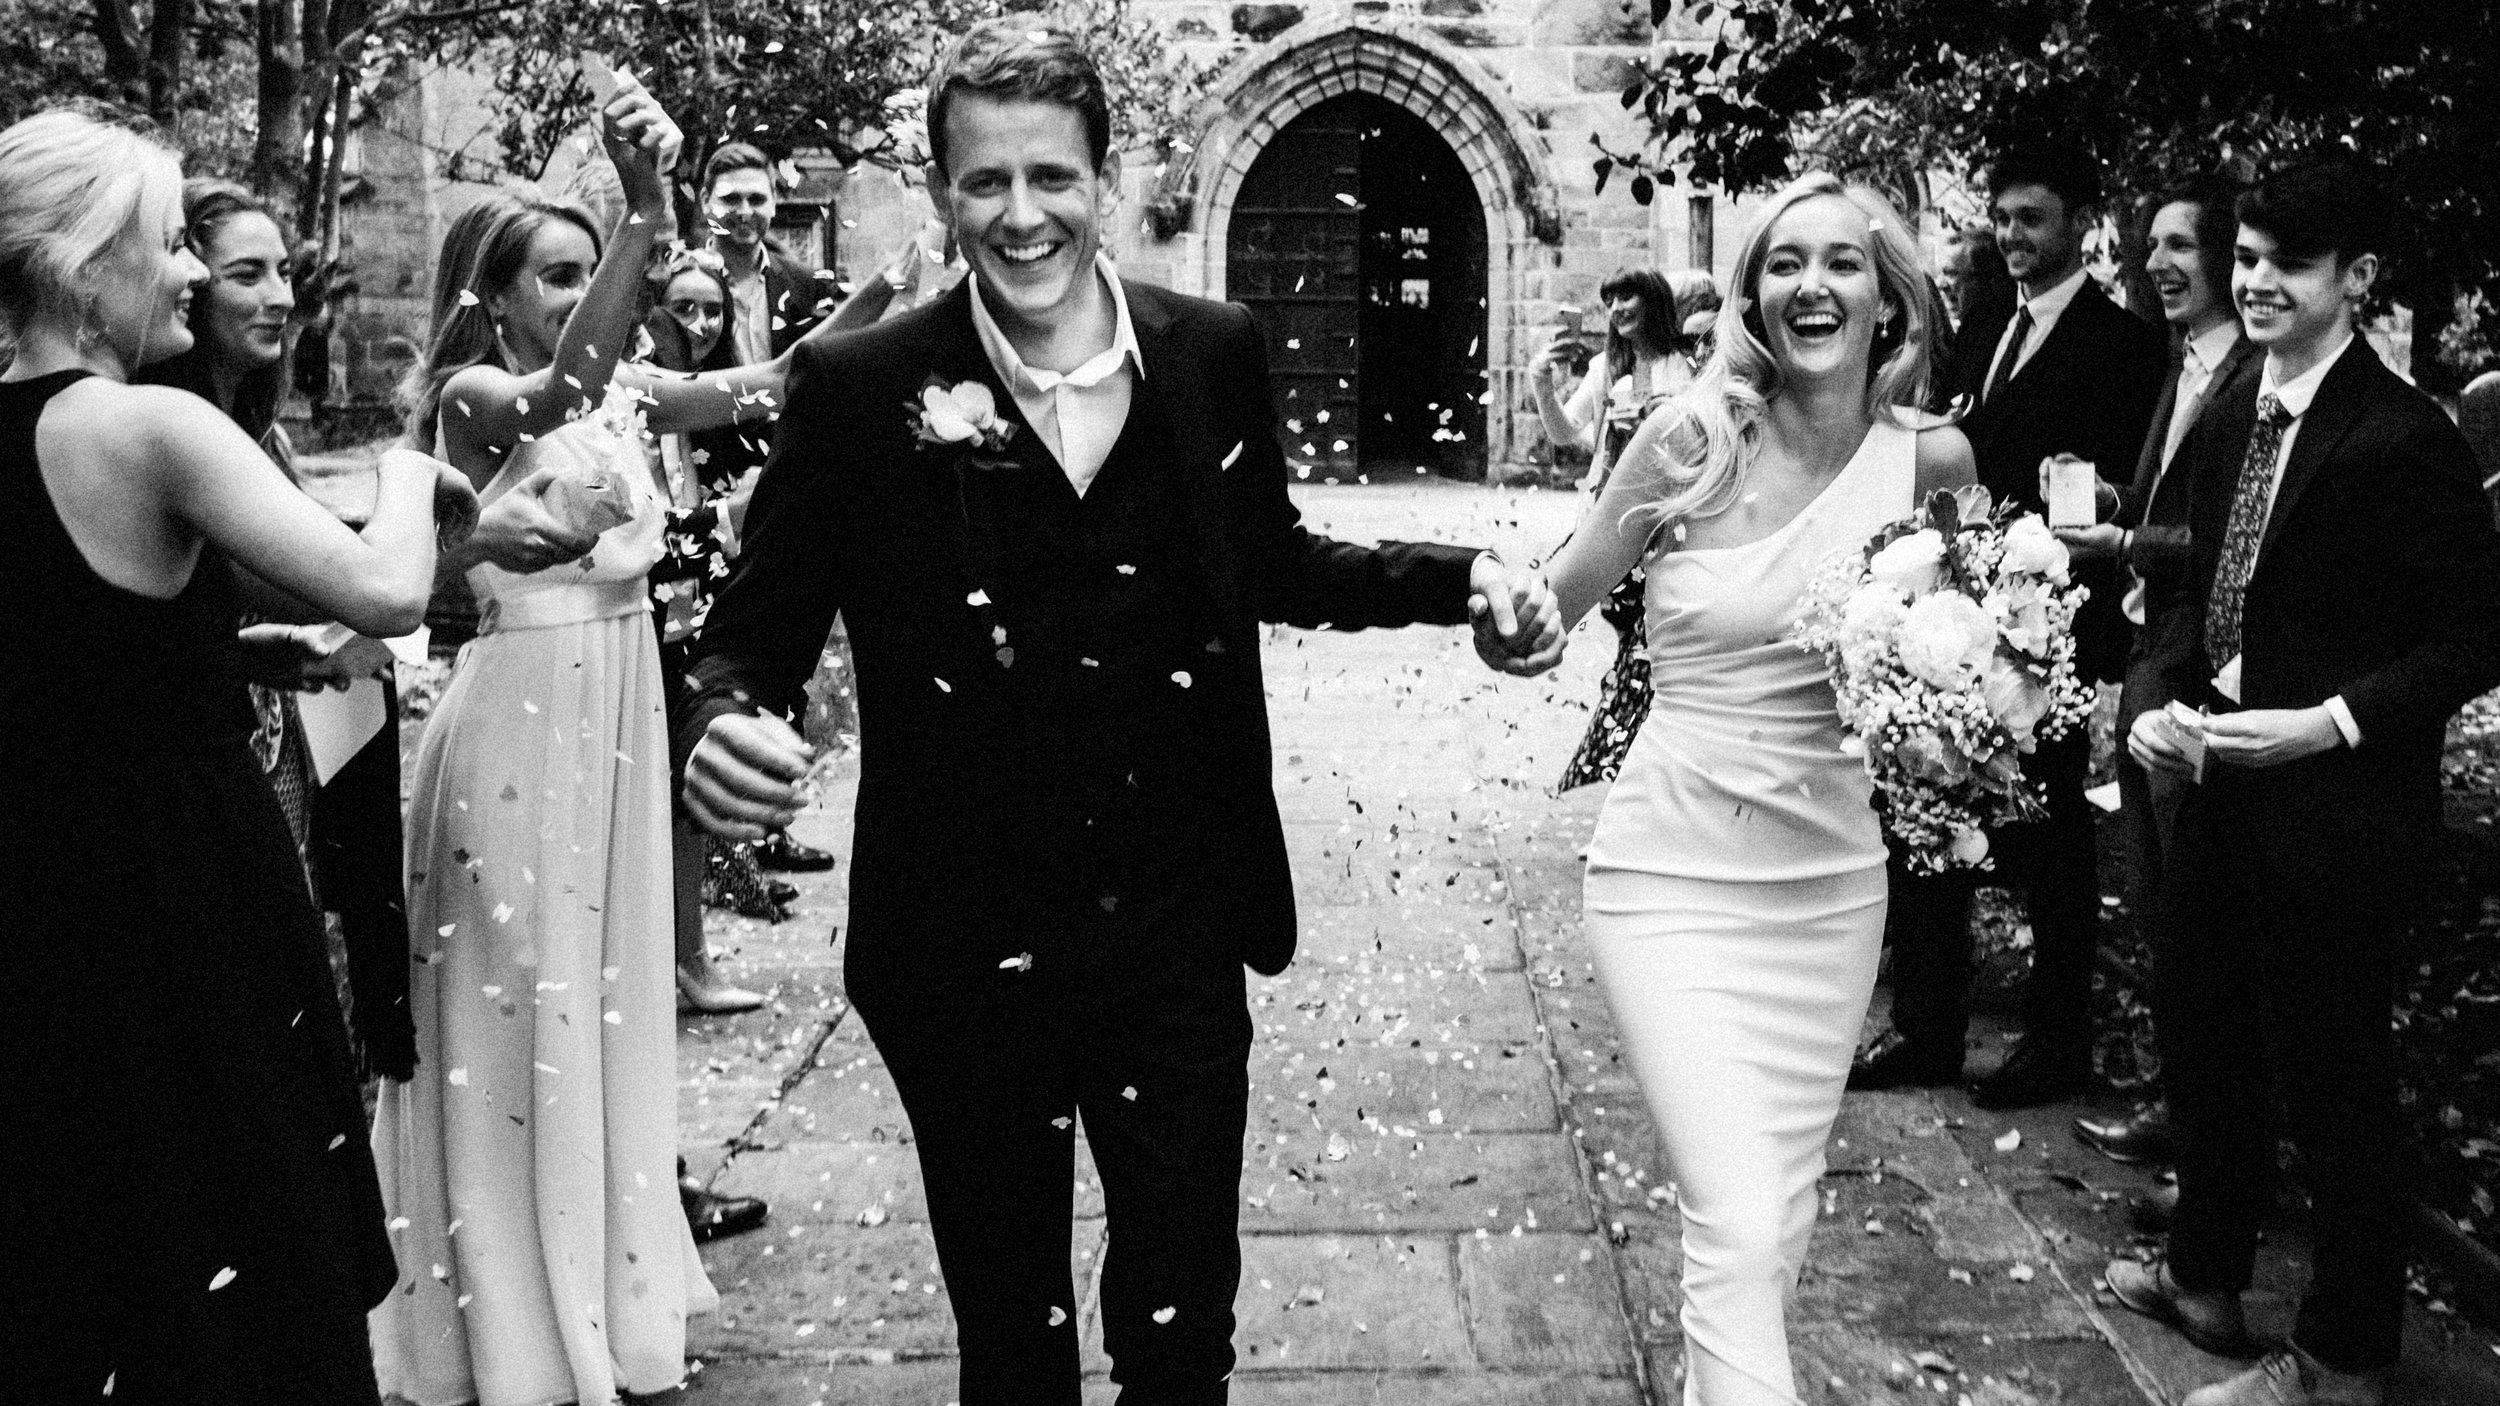 prestbury-cheshire-wedding-photographer-0018.JPG